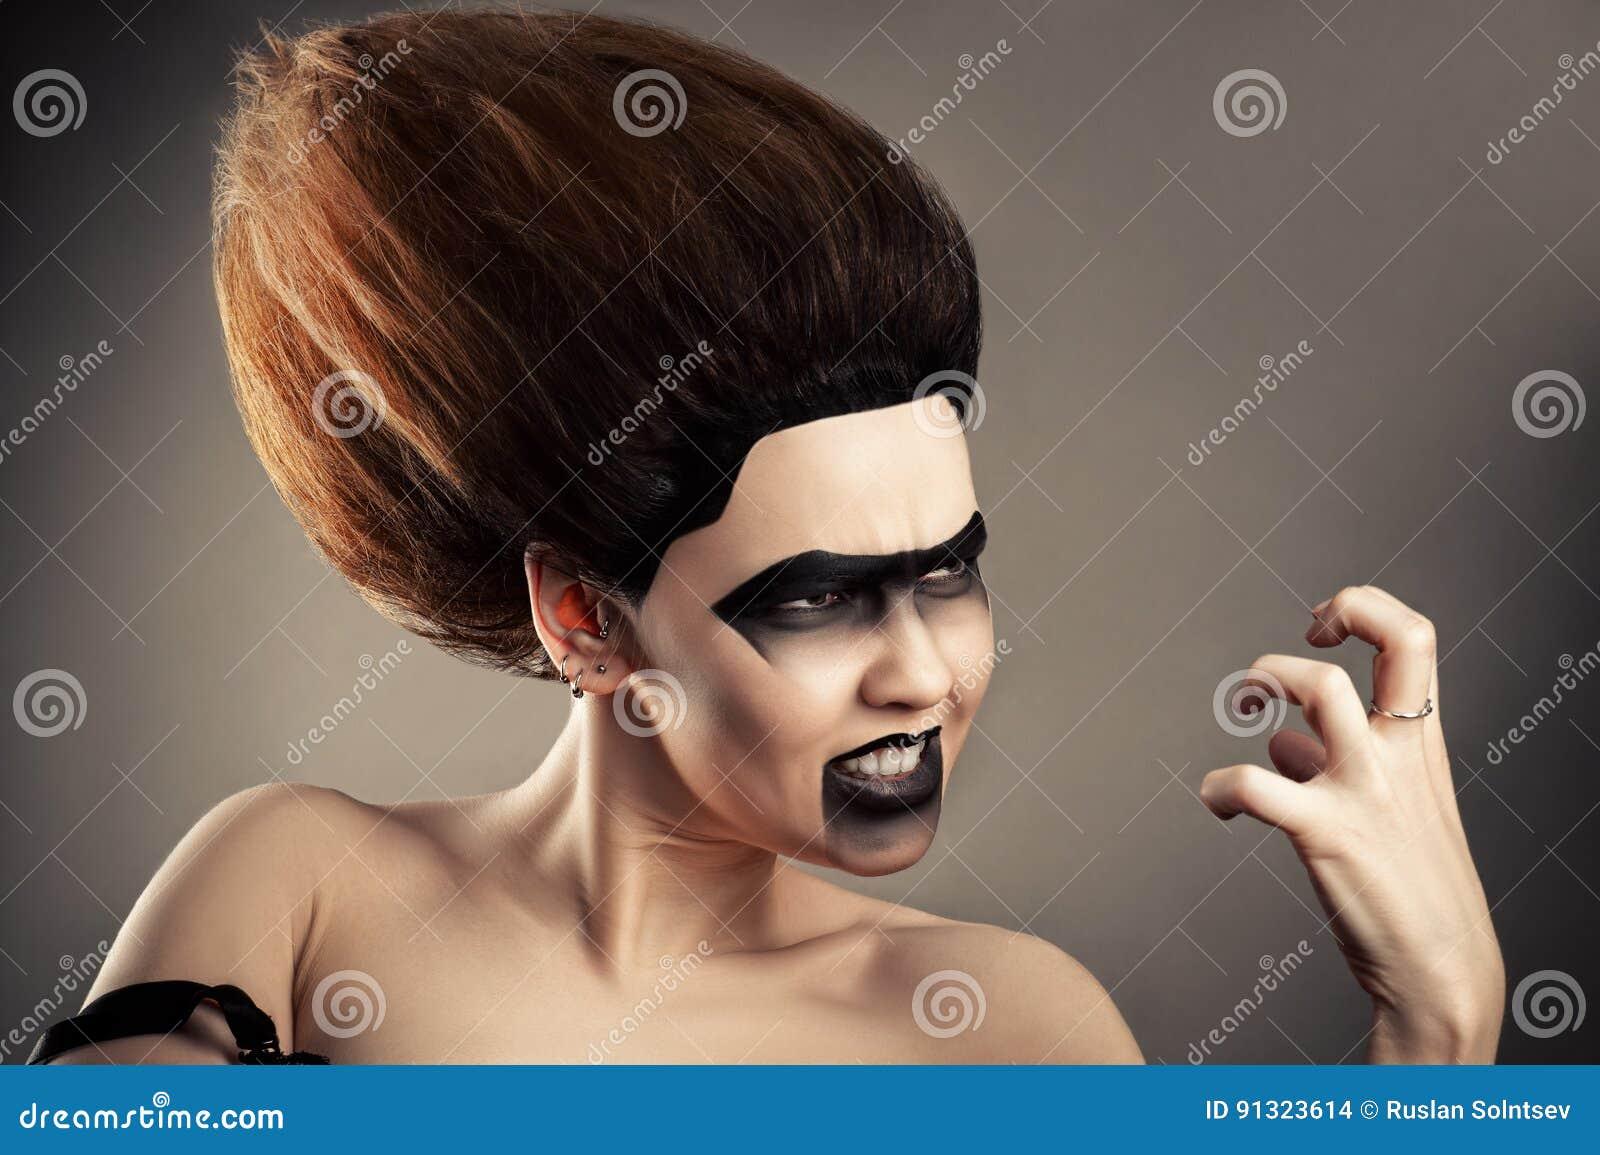 Boze donkerbruine vrouw met donkere make-up en weelderig kapsel